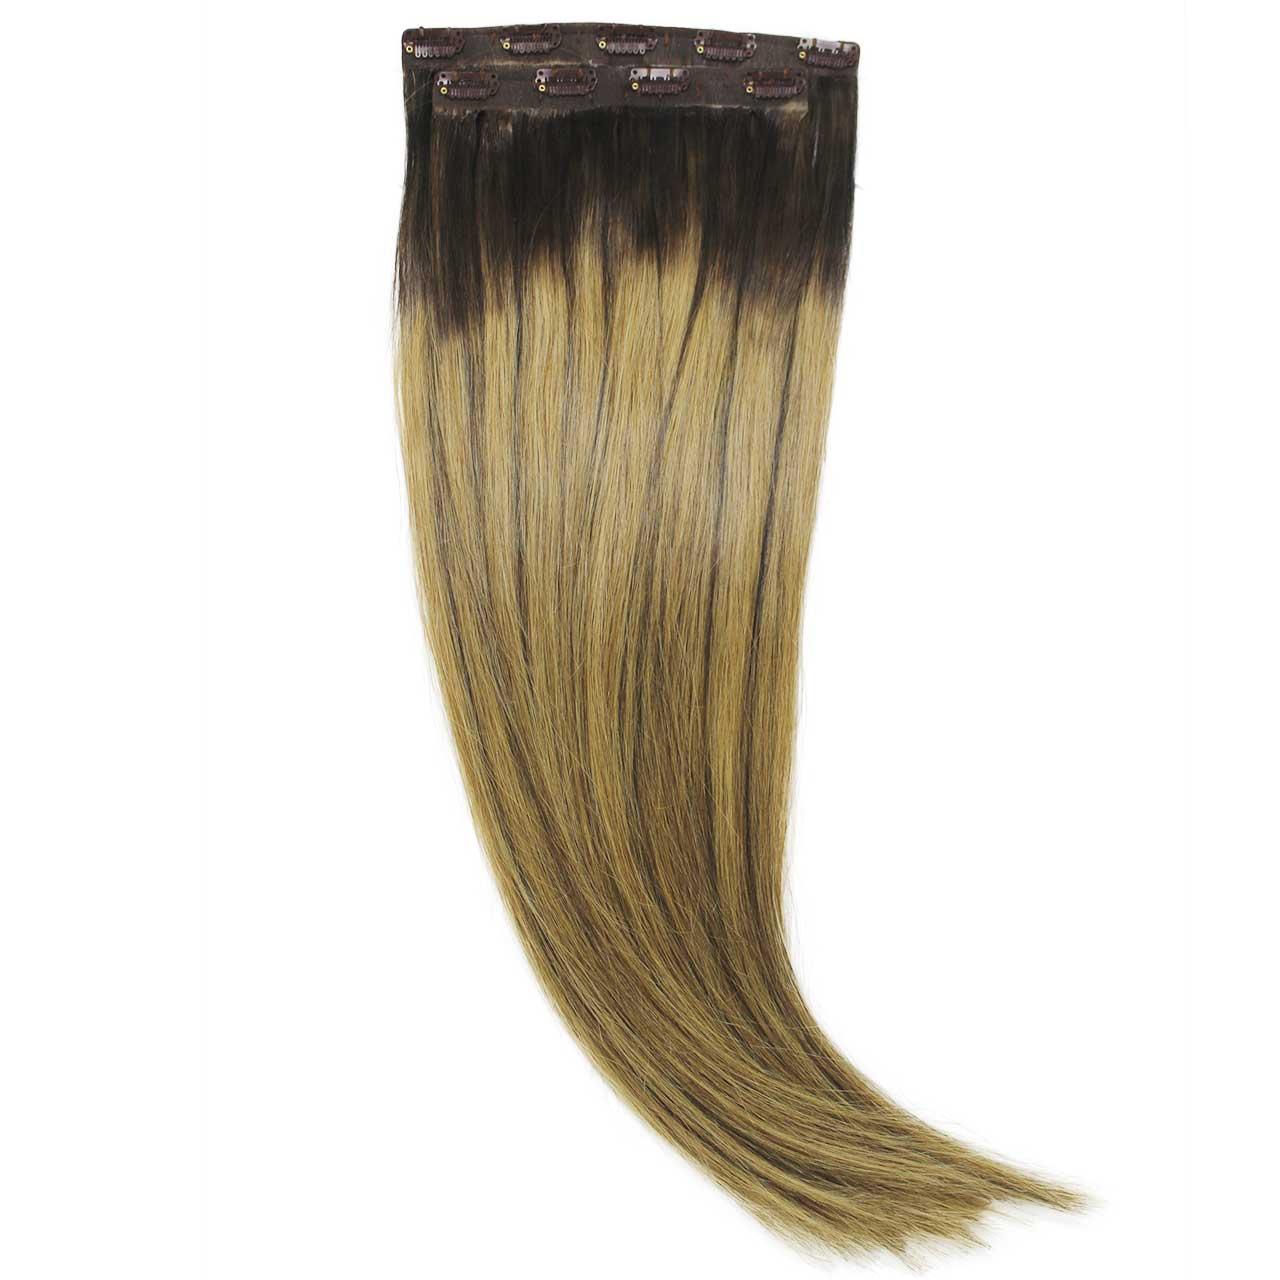 Aplique Tic Tac Ombré Hair 120g Cabelos Humanos Naturais Liso